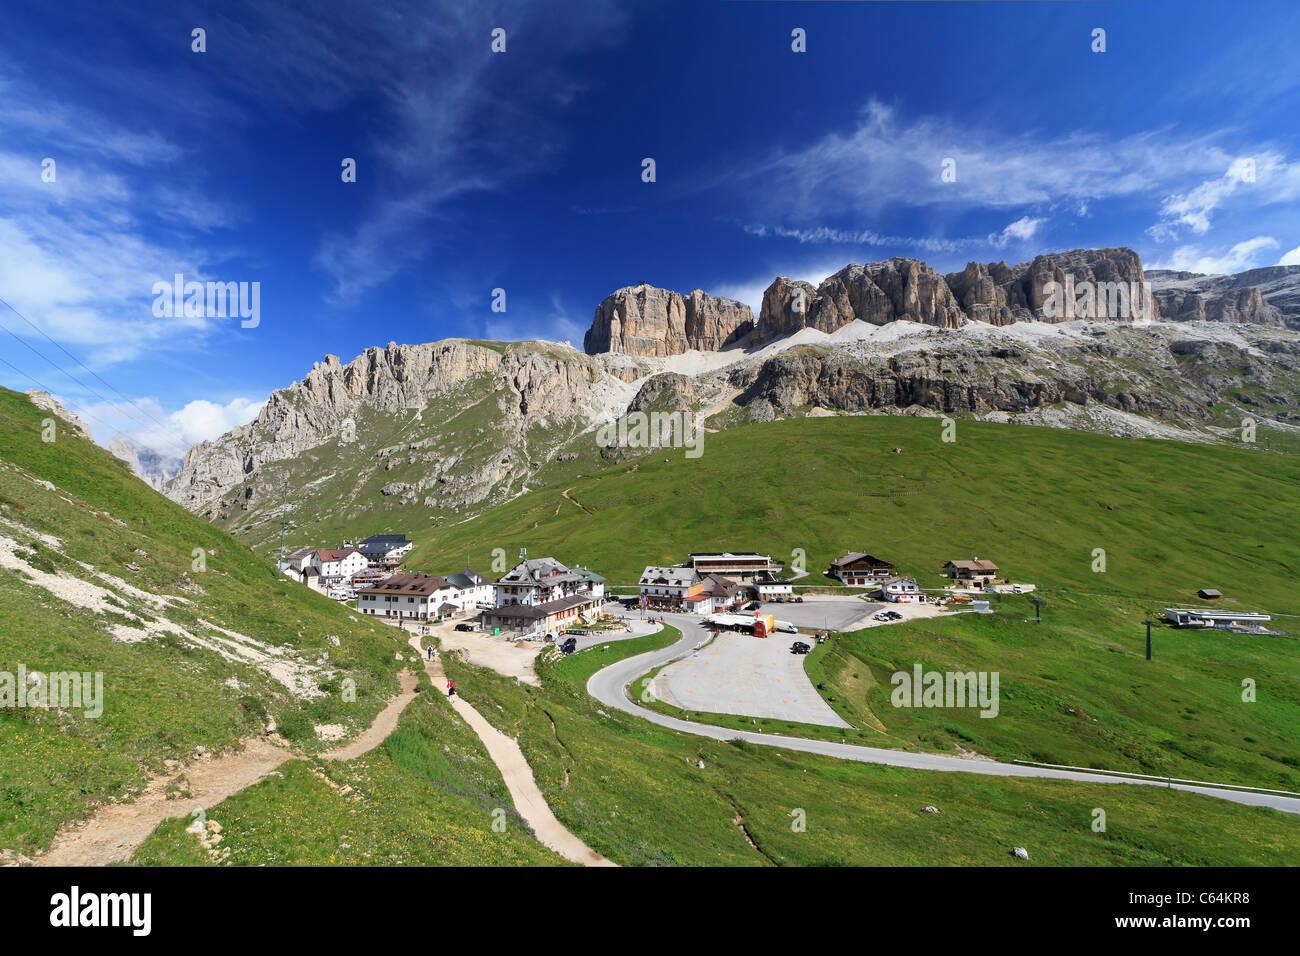 Pordoi pass between Arabba and Canazei, Italian Dolomites - Stock Image